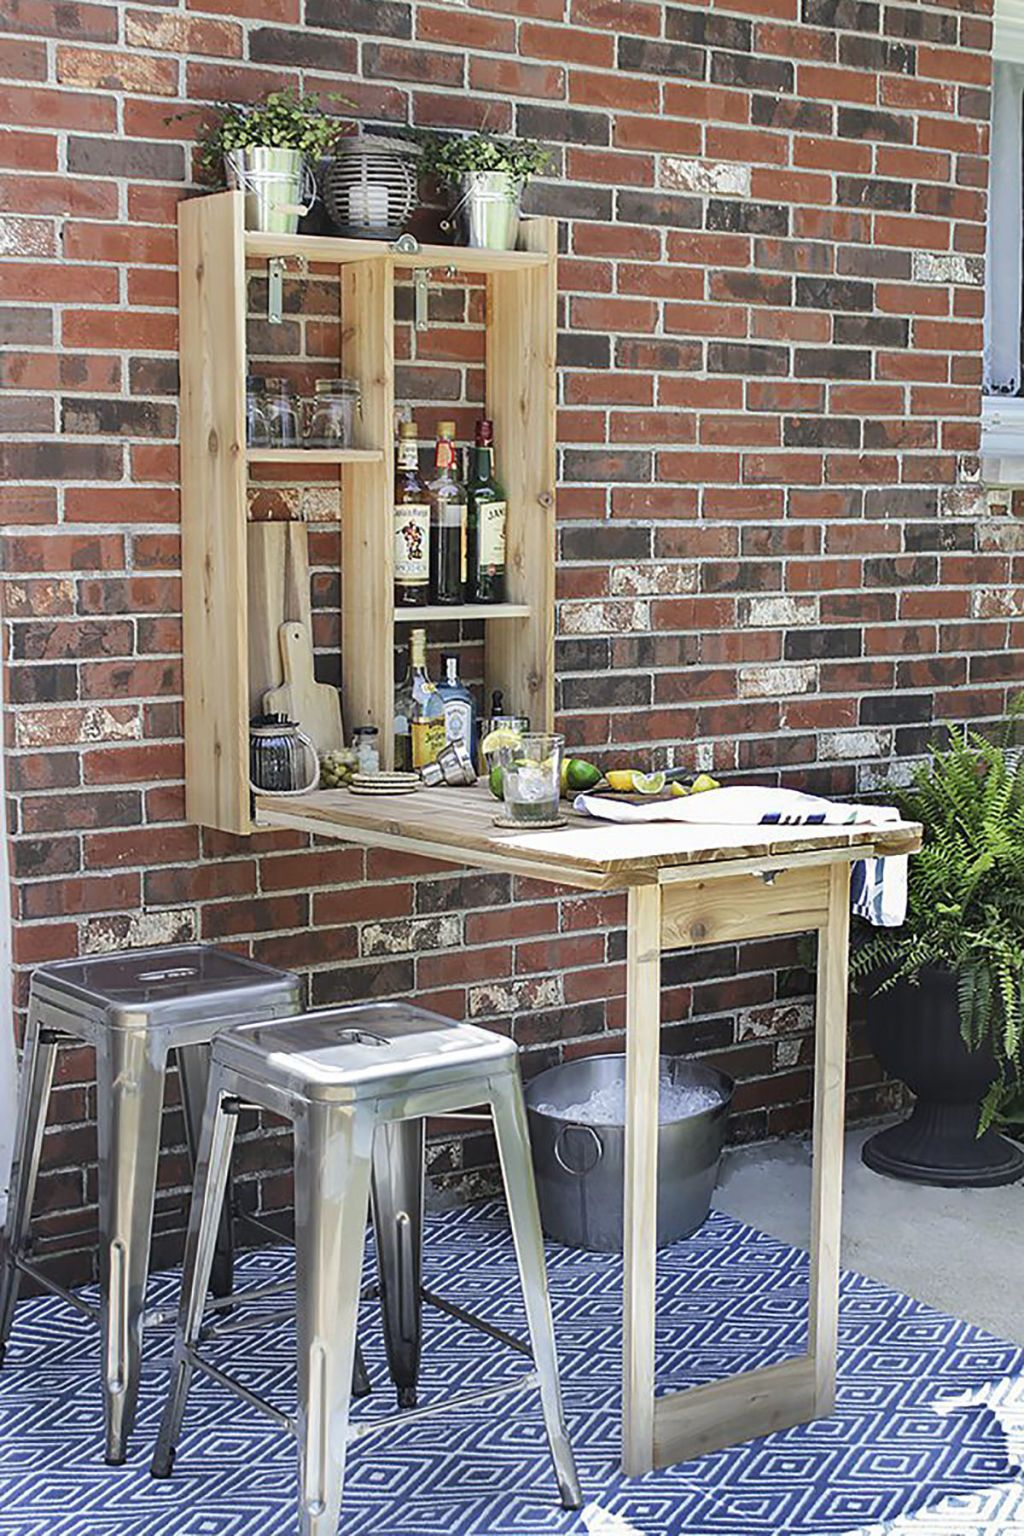 25 Creative Ways to Make the Most Of a Tiny Backyard   Bar, Garden on creative pool deck ideas, creative diy kitchen ideas, creative kitchen backsplash ideas, creative small kitchen design ideas,